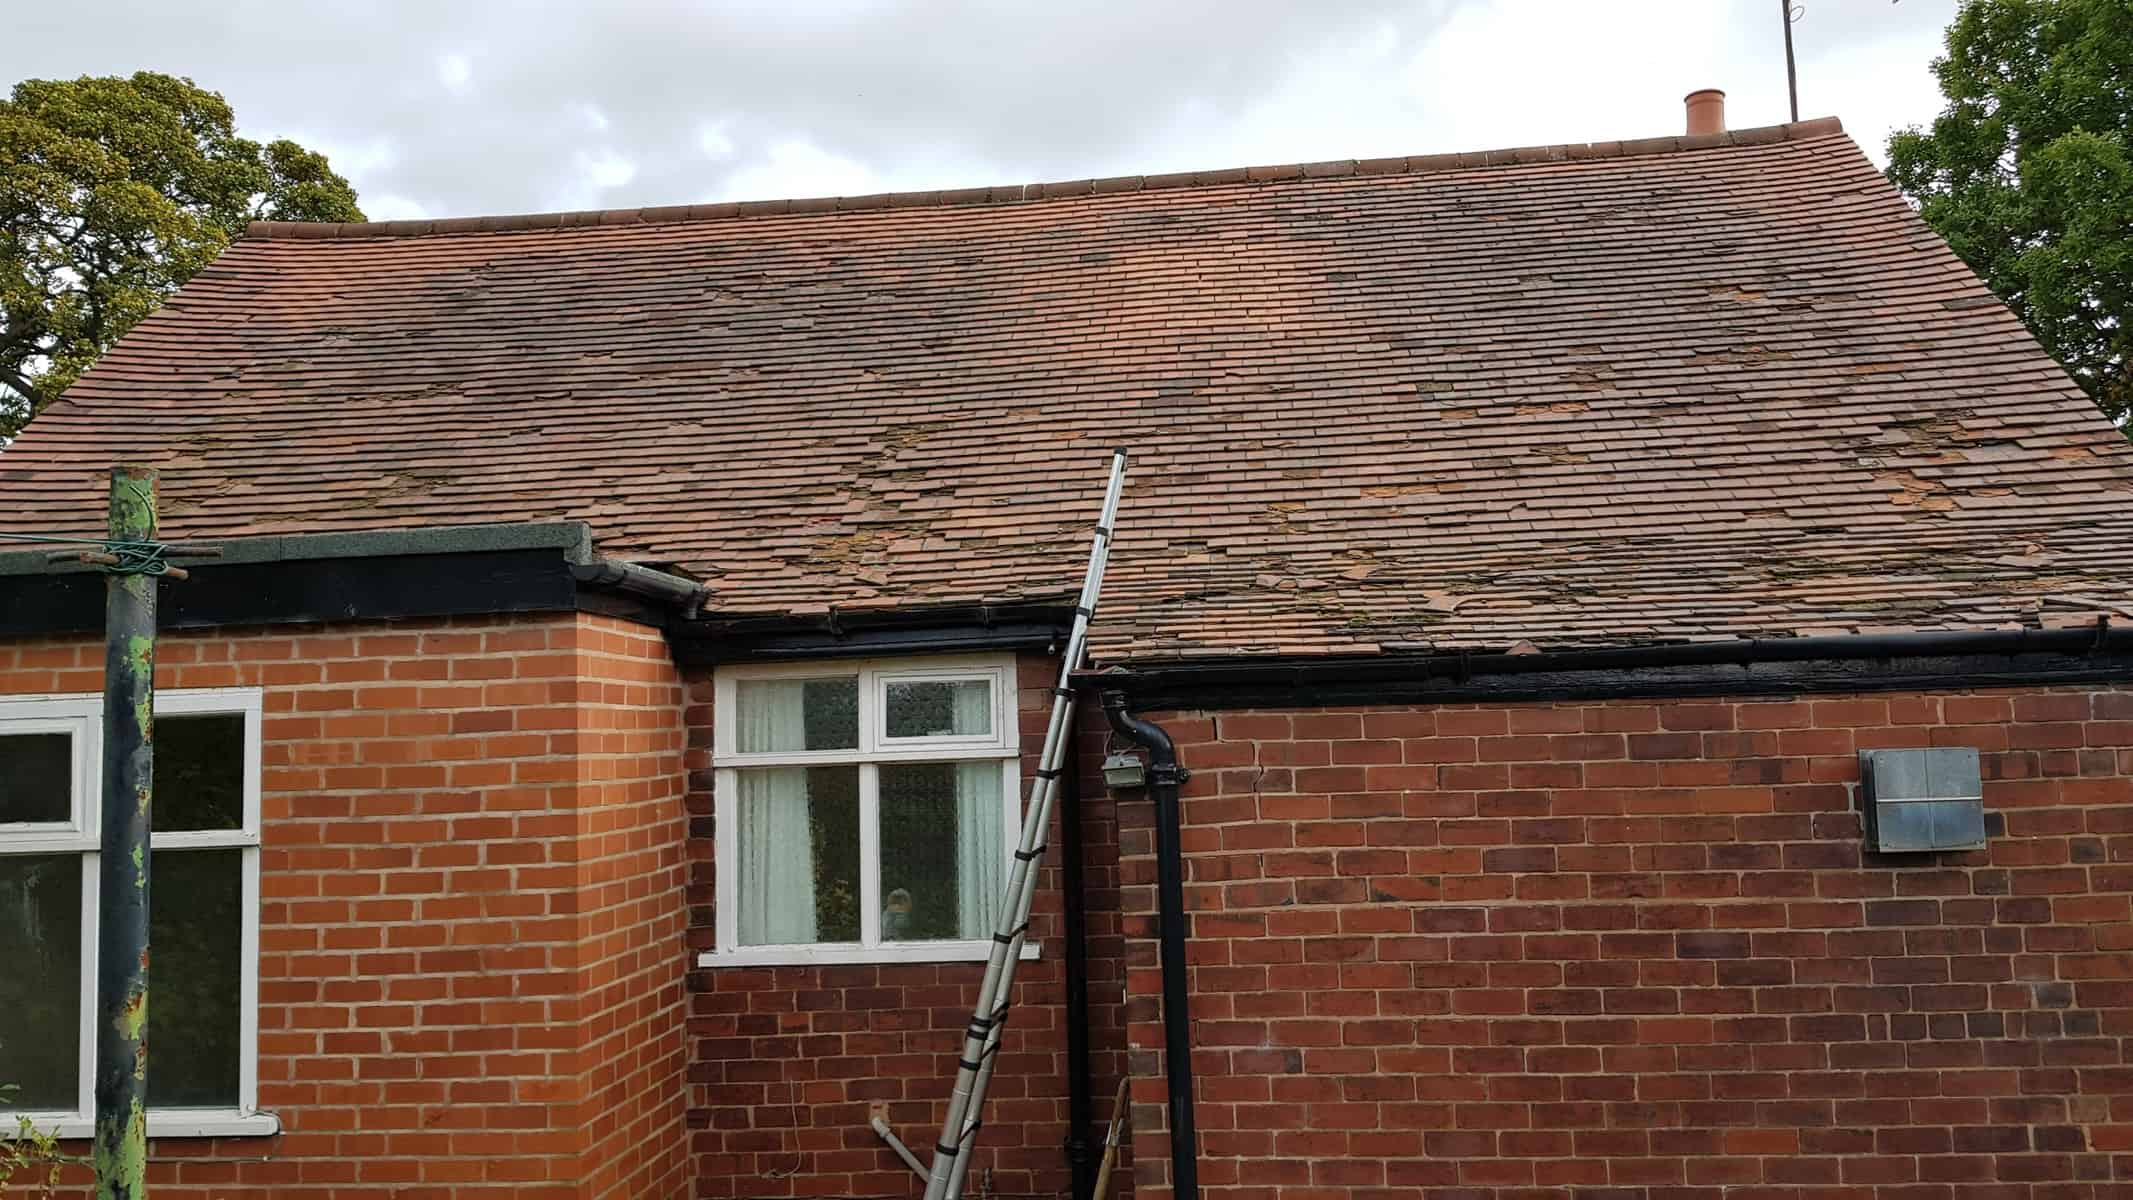 Bat Survey, Holymoorside, Chesterfield